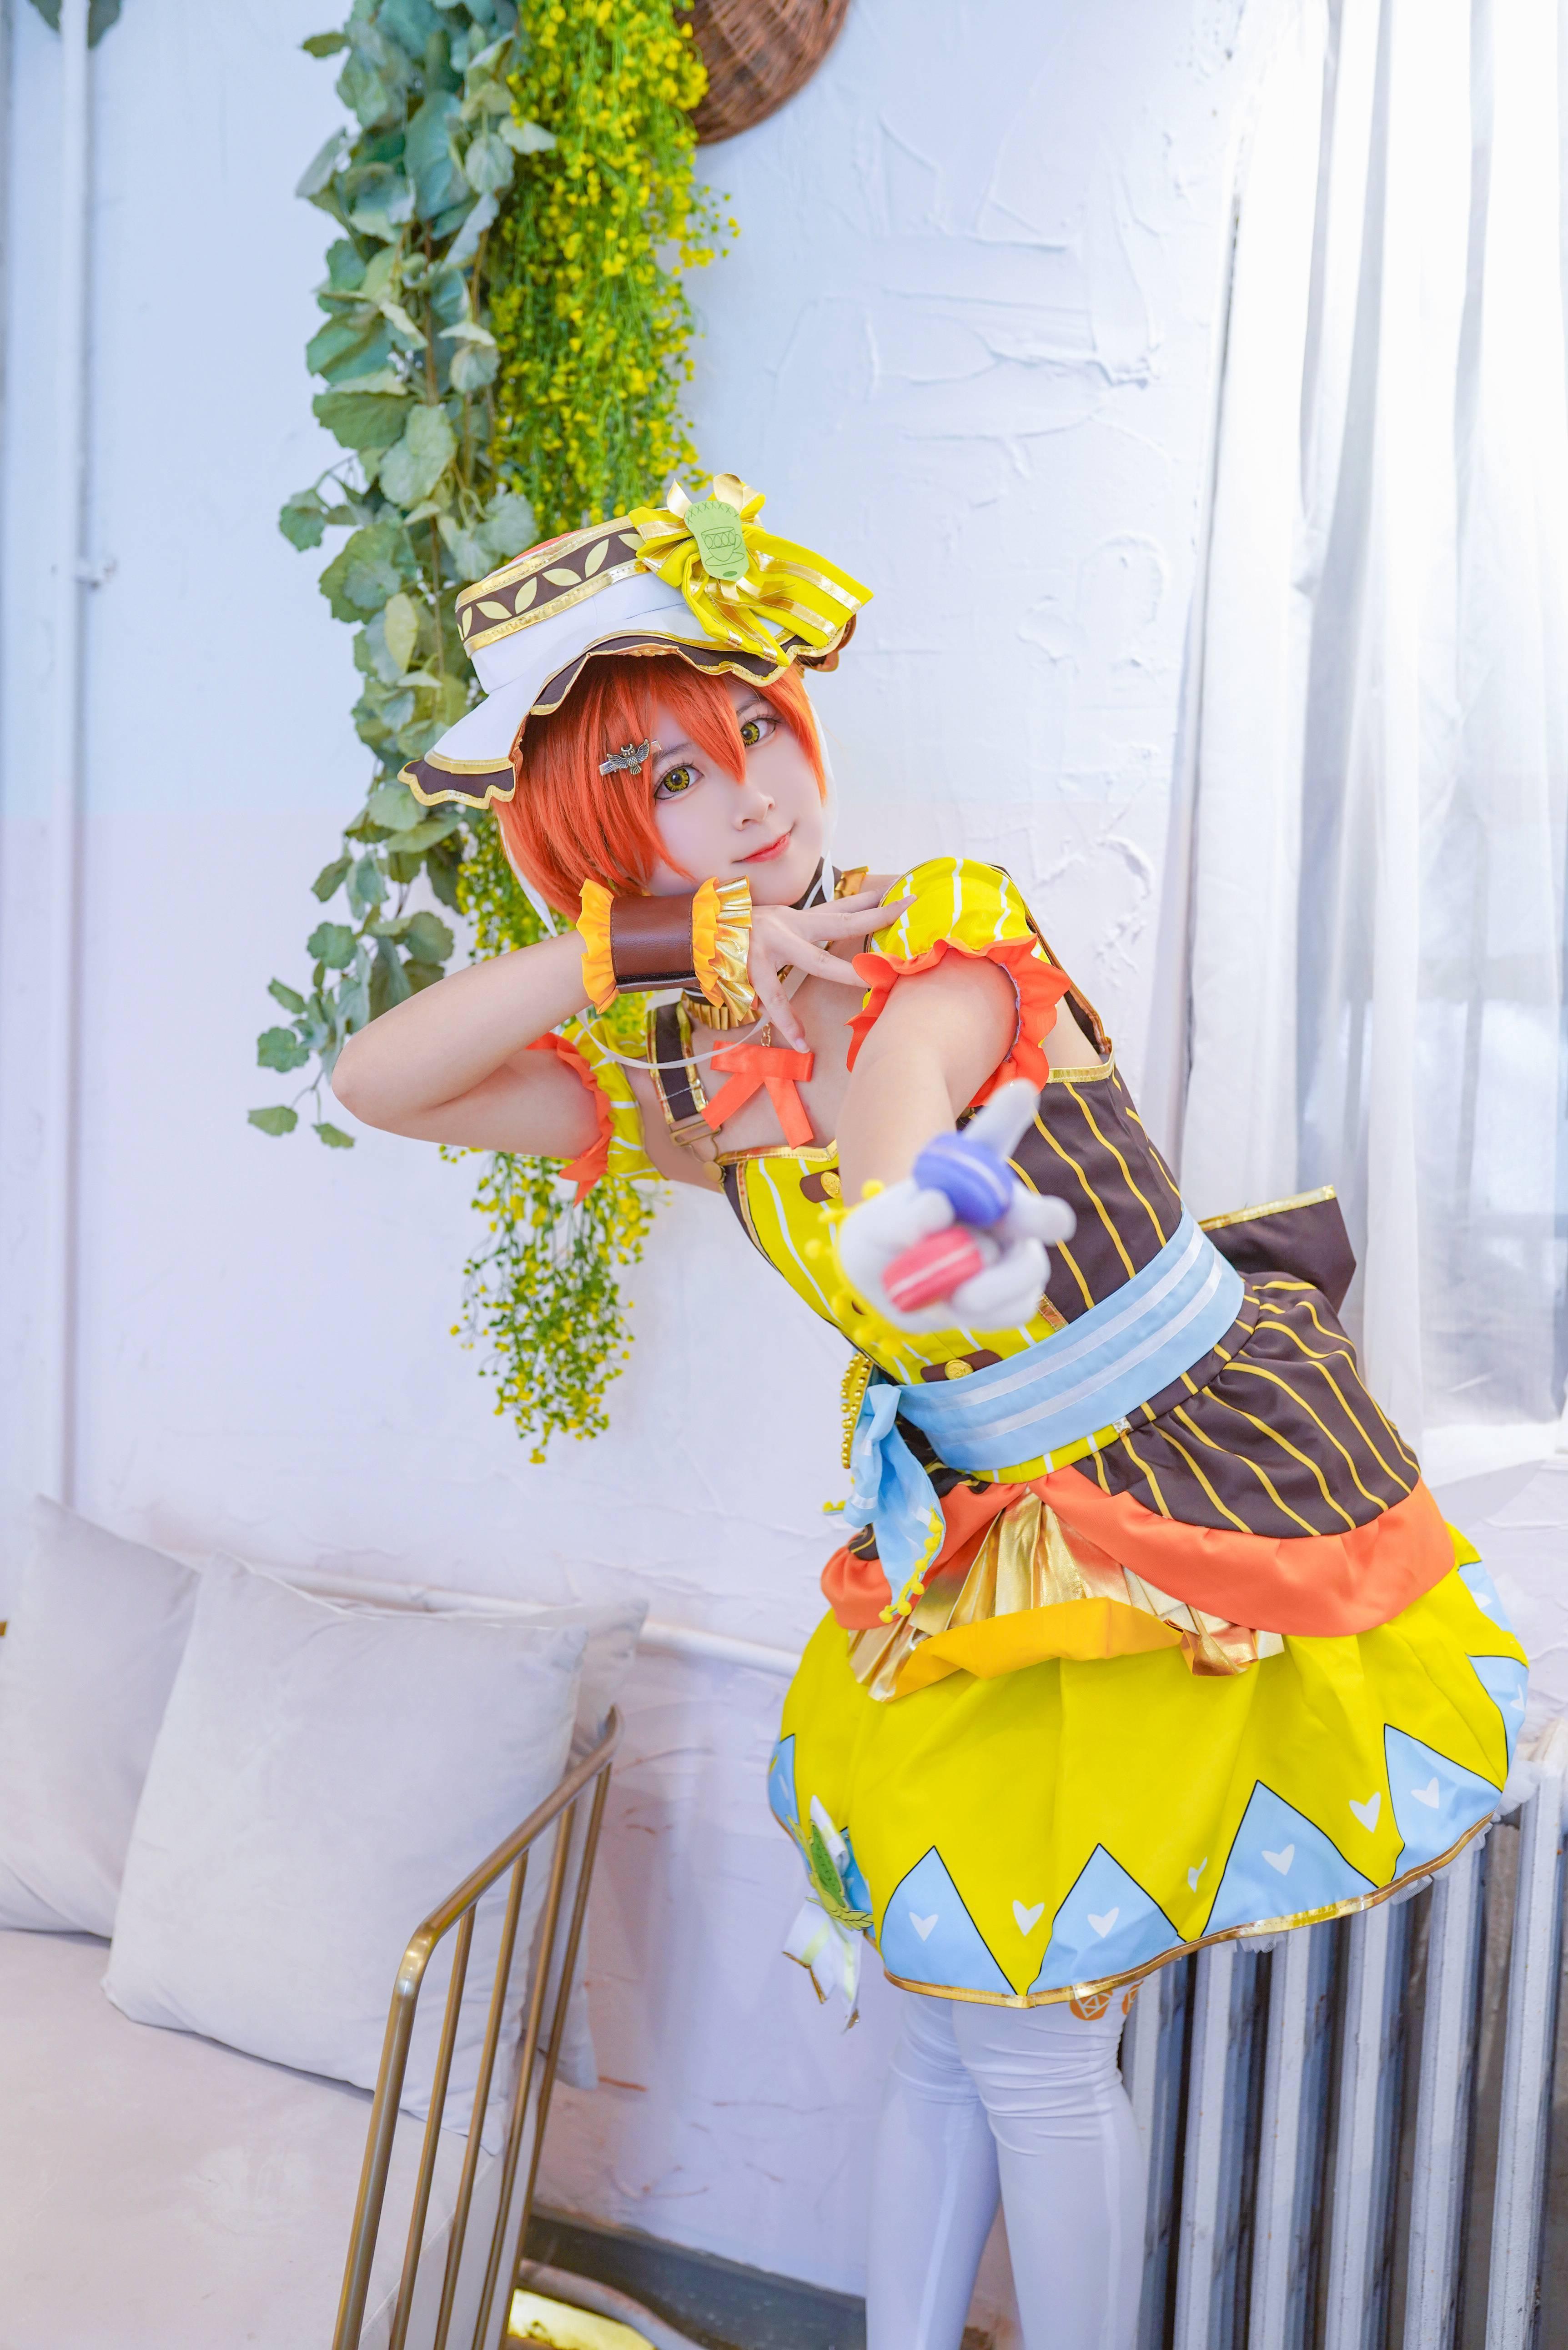 《LOVE LIVE!》少女cosplay【CN:_李笑颜Lee】-第9张